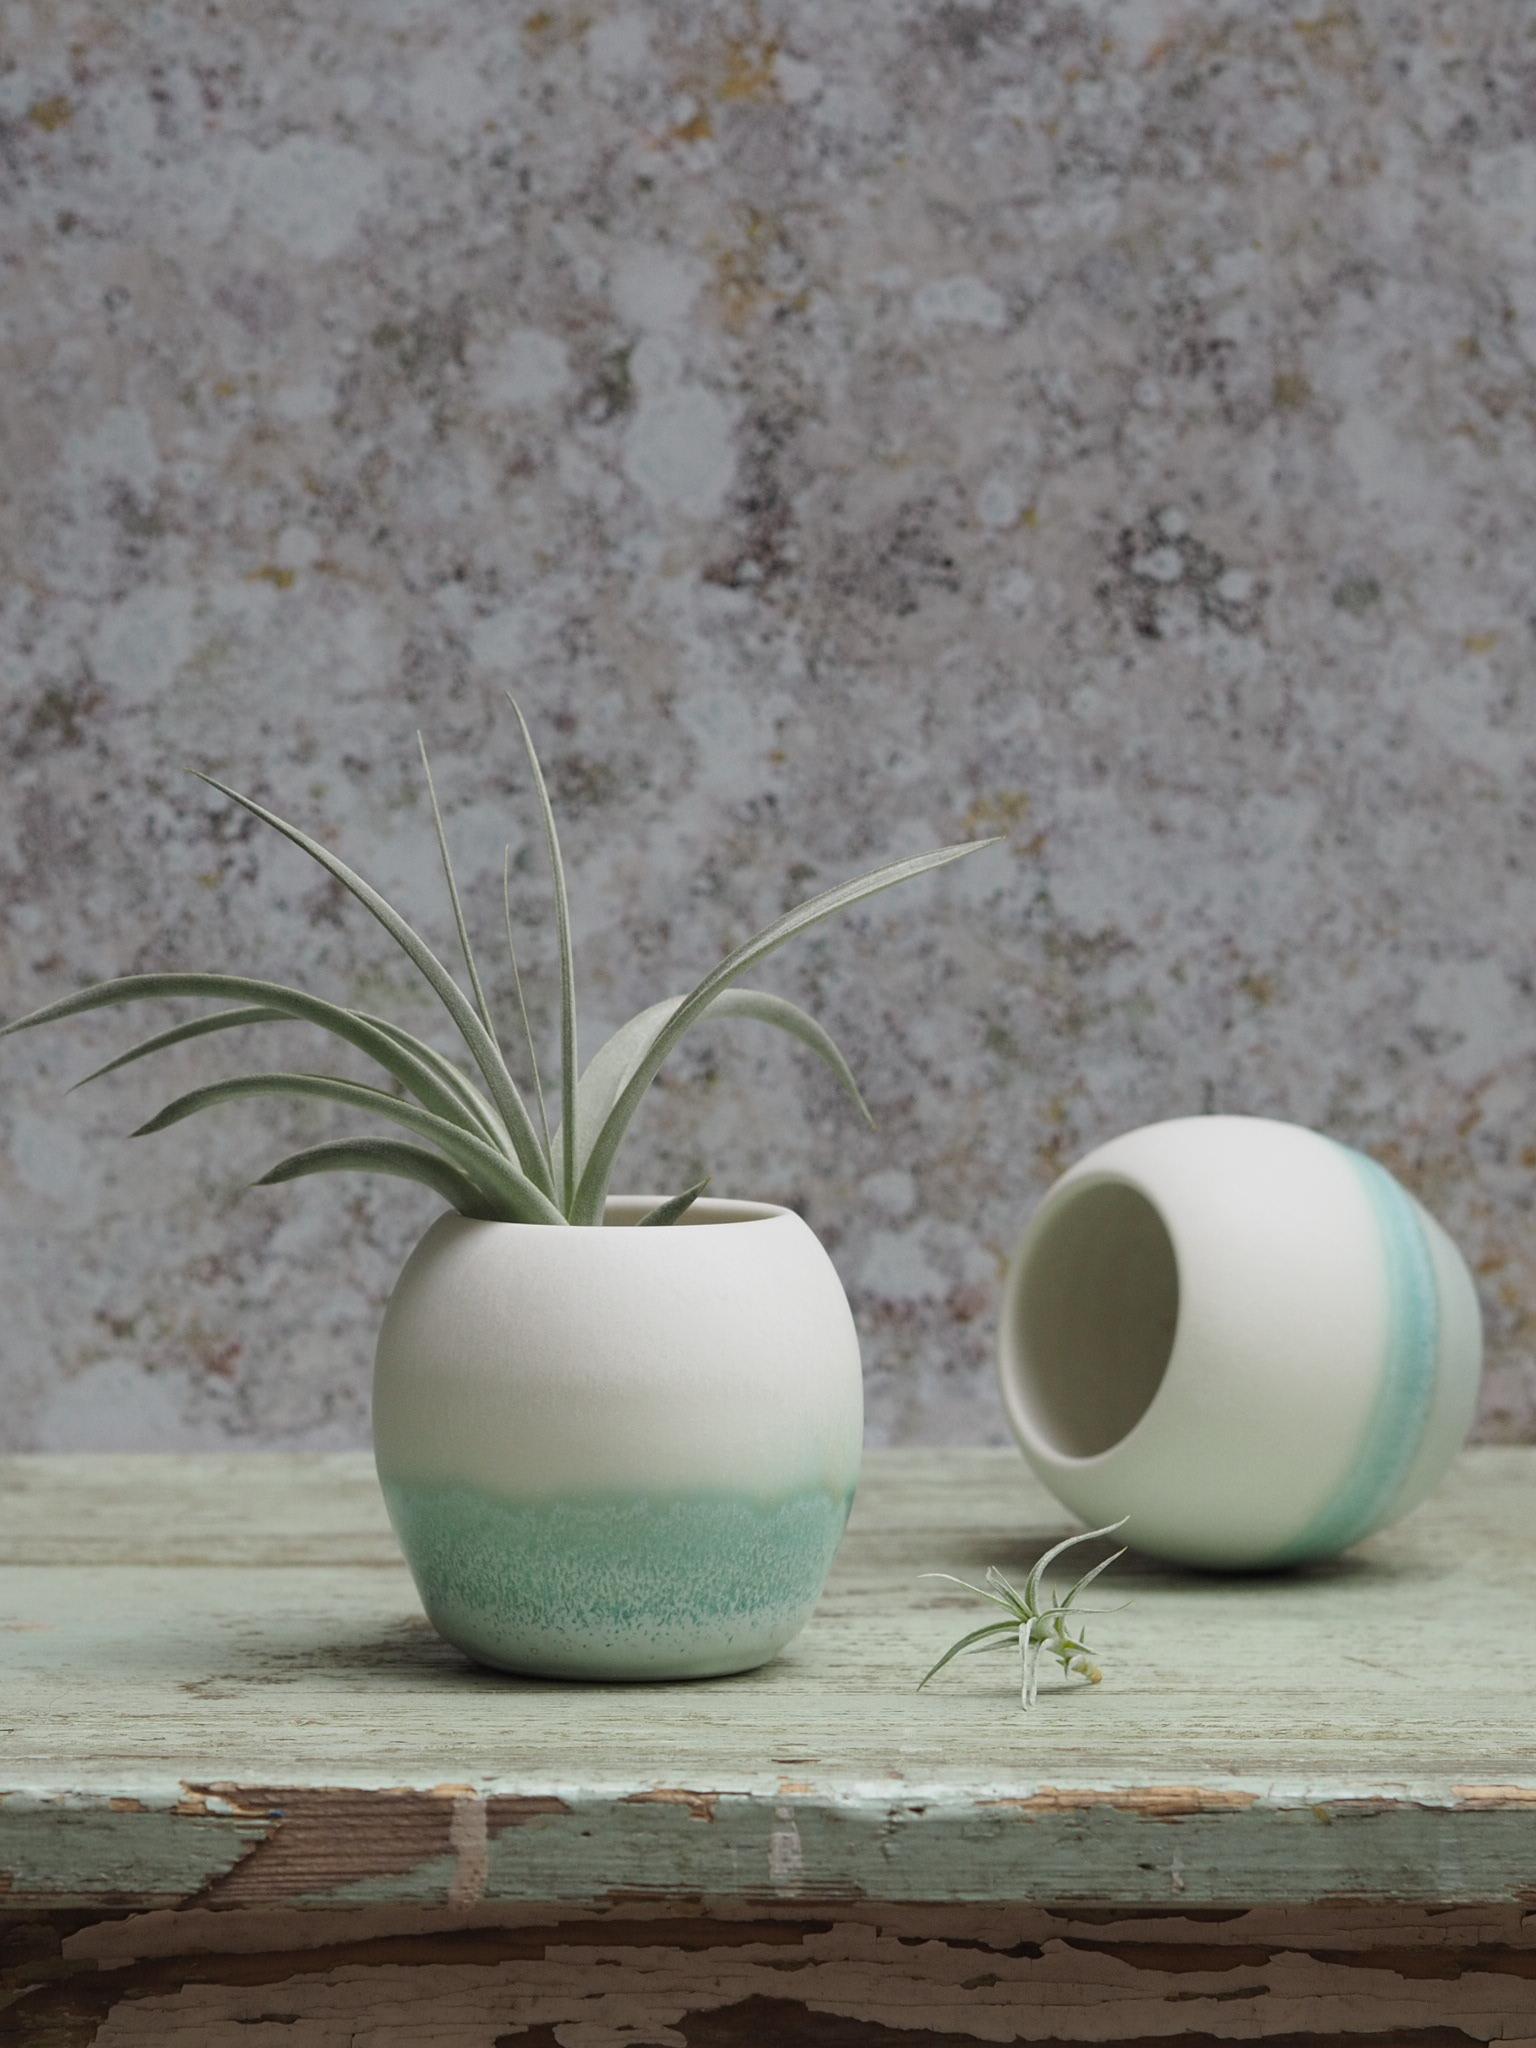 A close-up of the glaze detail on a Kt Robbins Ceramics sea-pearl porcelain plant pot